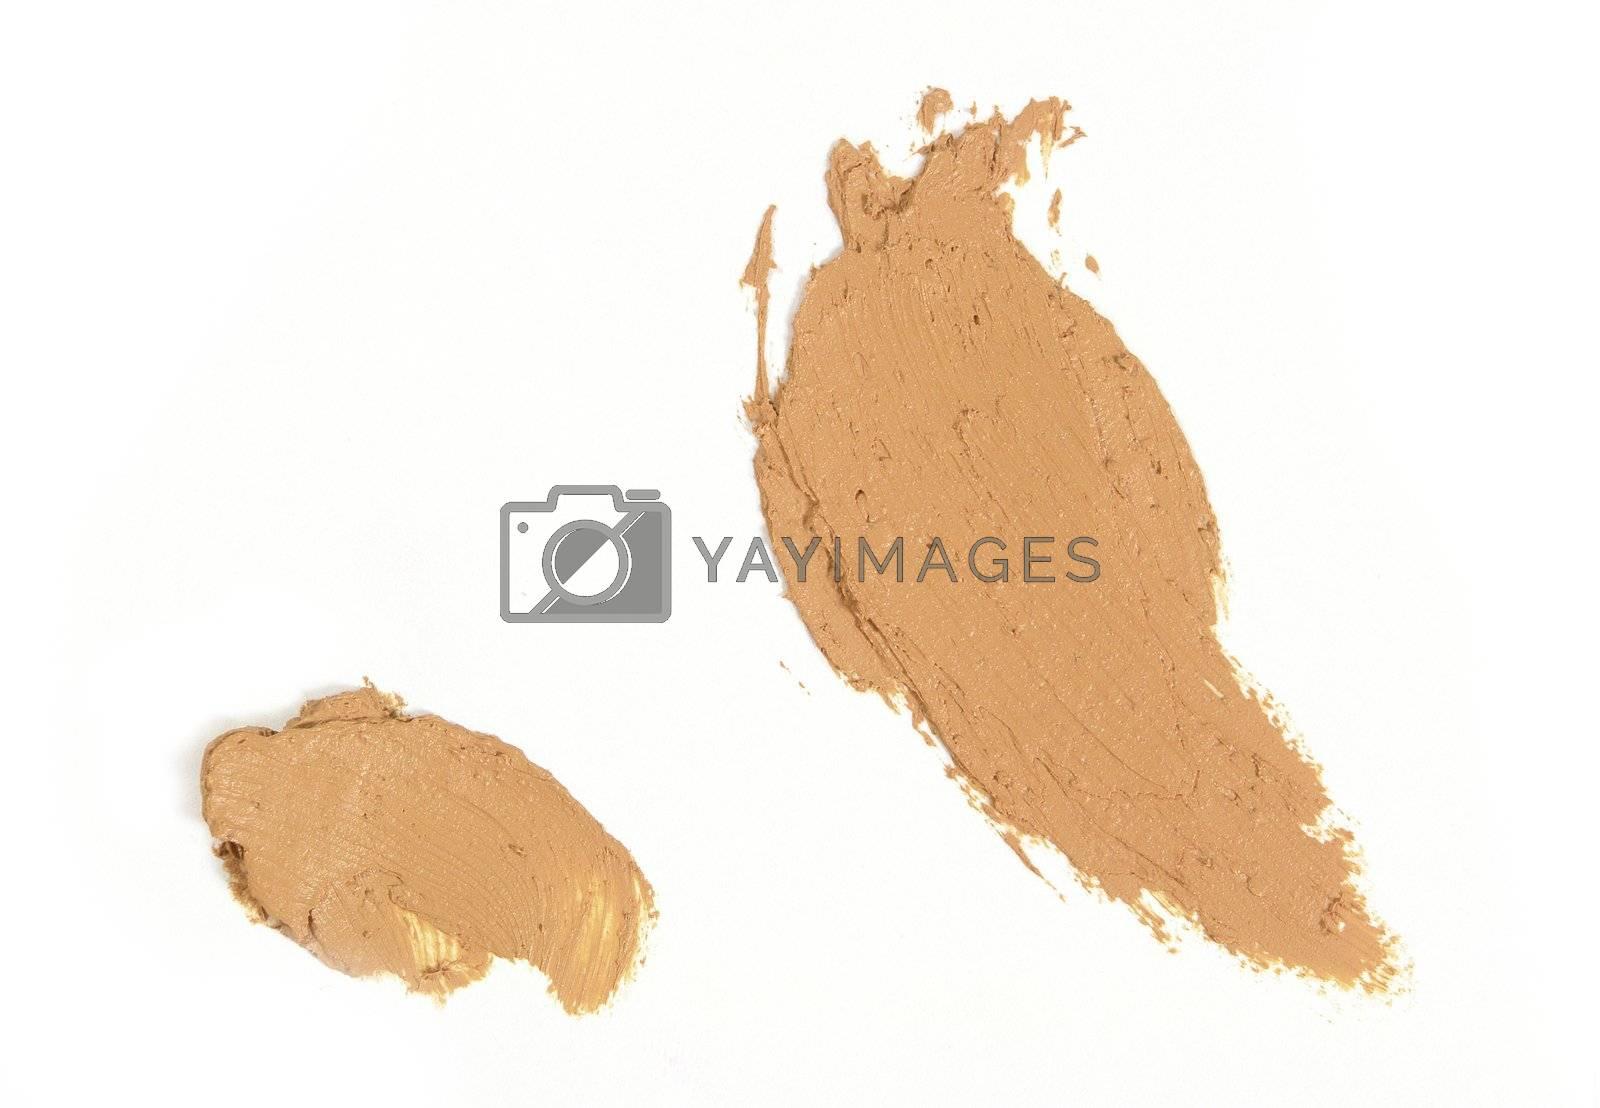 Cream Compact powder sample for fashion magazine